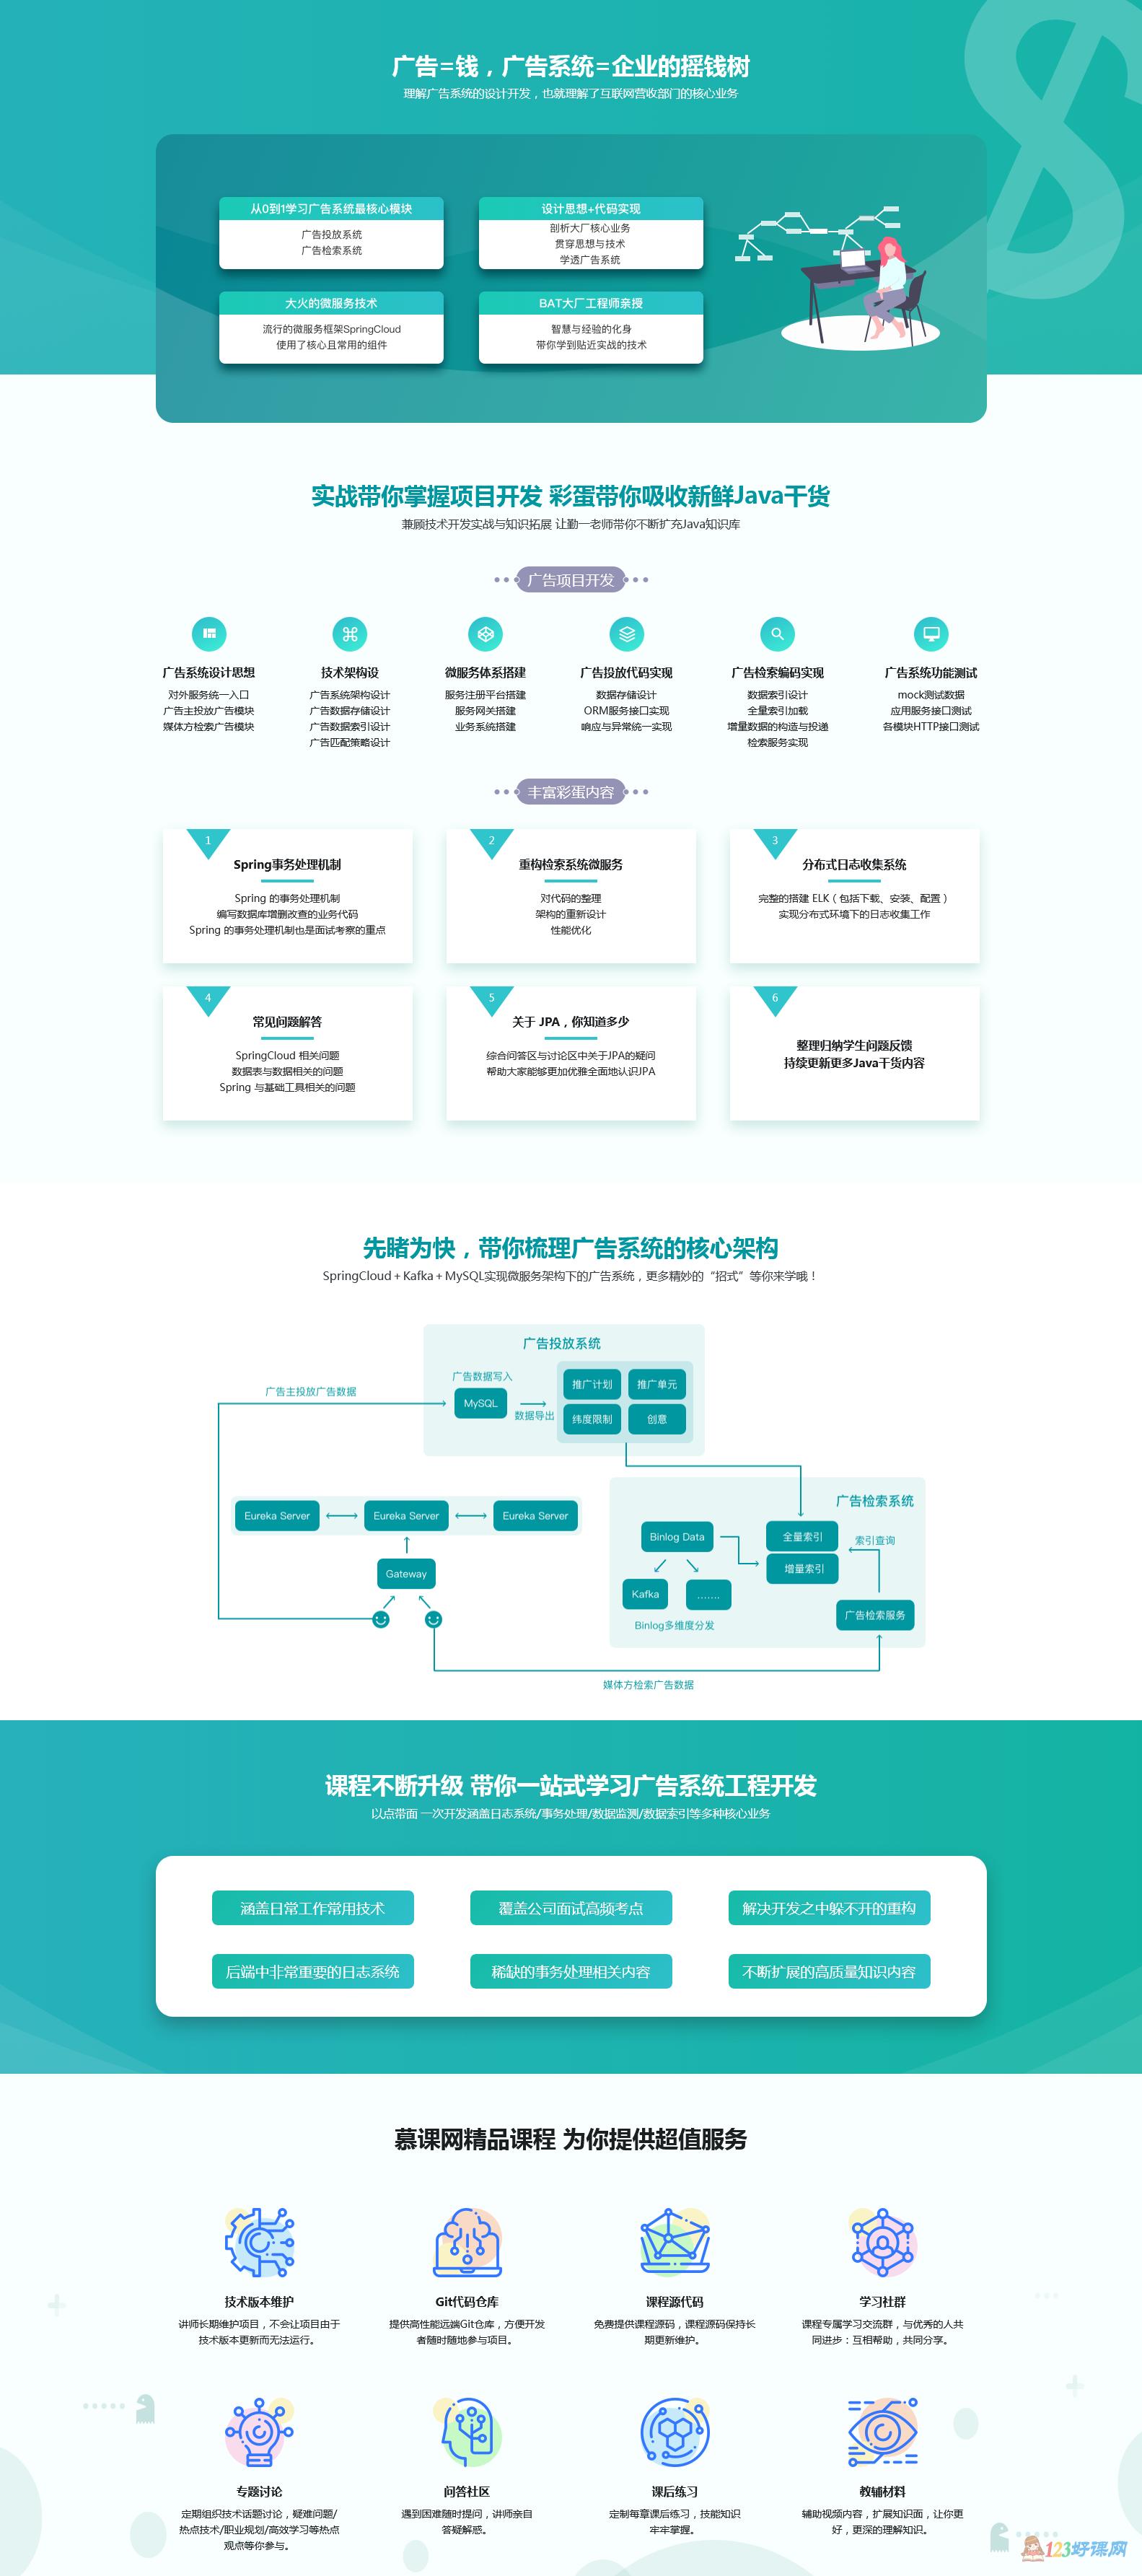 Spring Cloud广告系统设计与实现视频课程